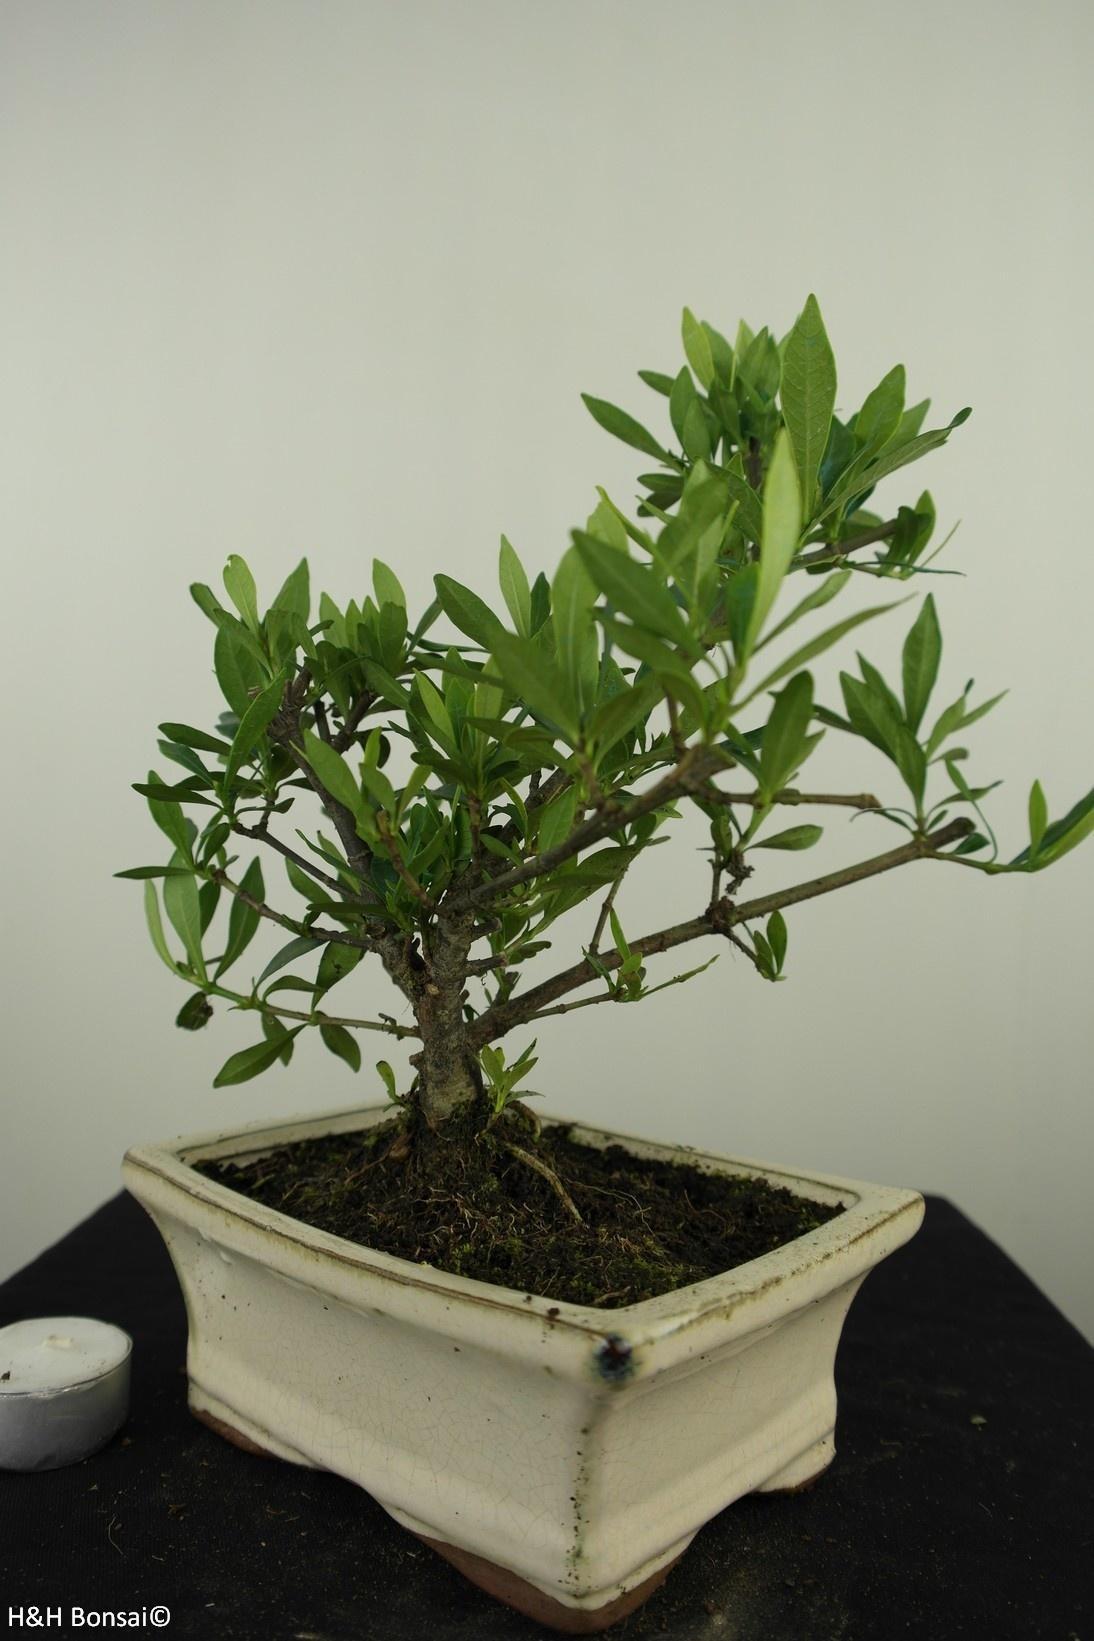 Bonsai Gardenie, Gardenia jasminoides, nr. 7610